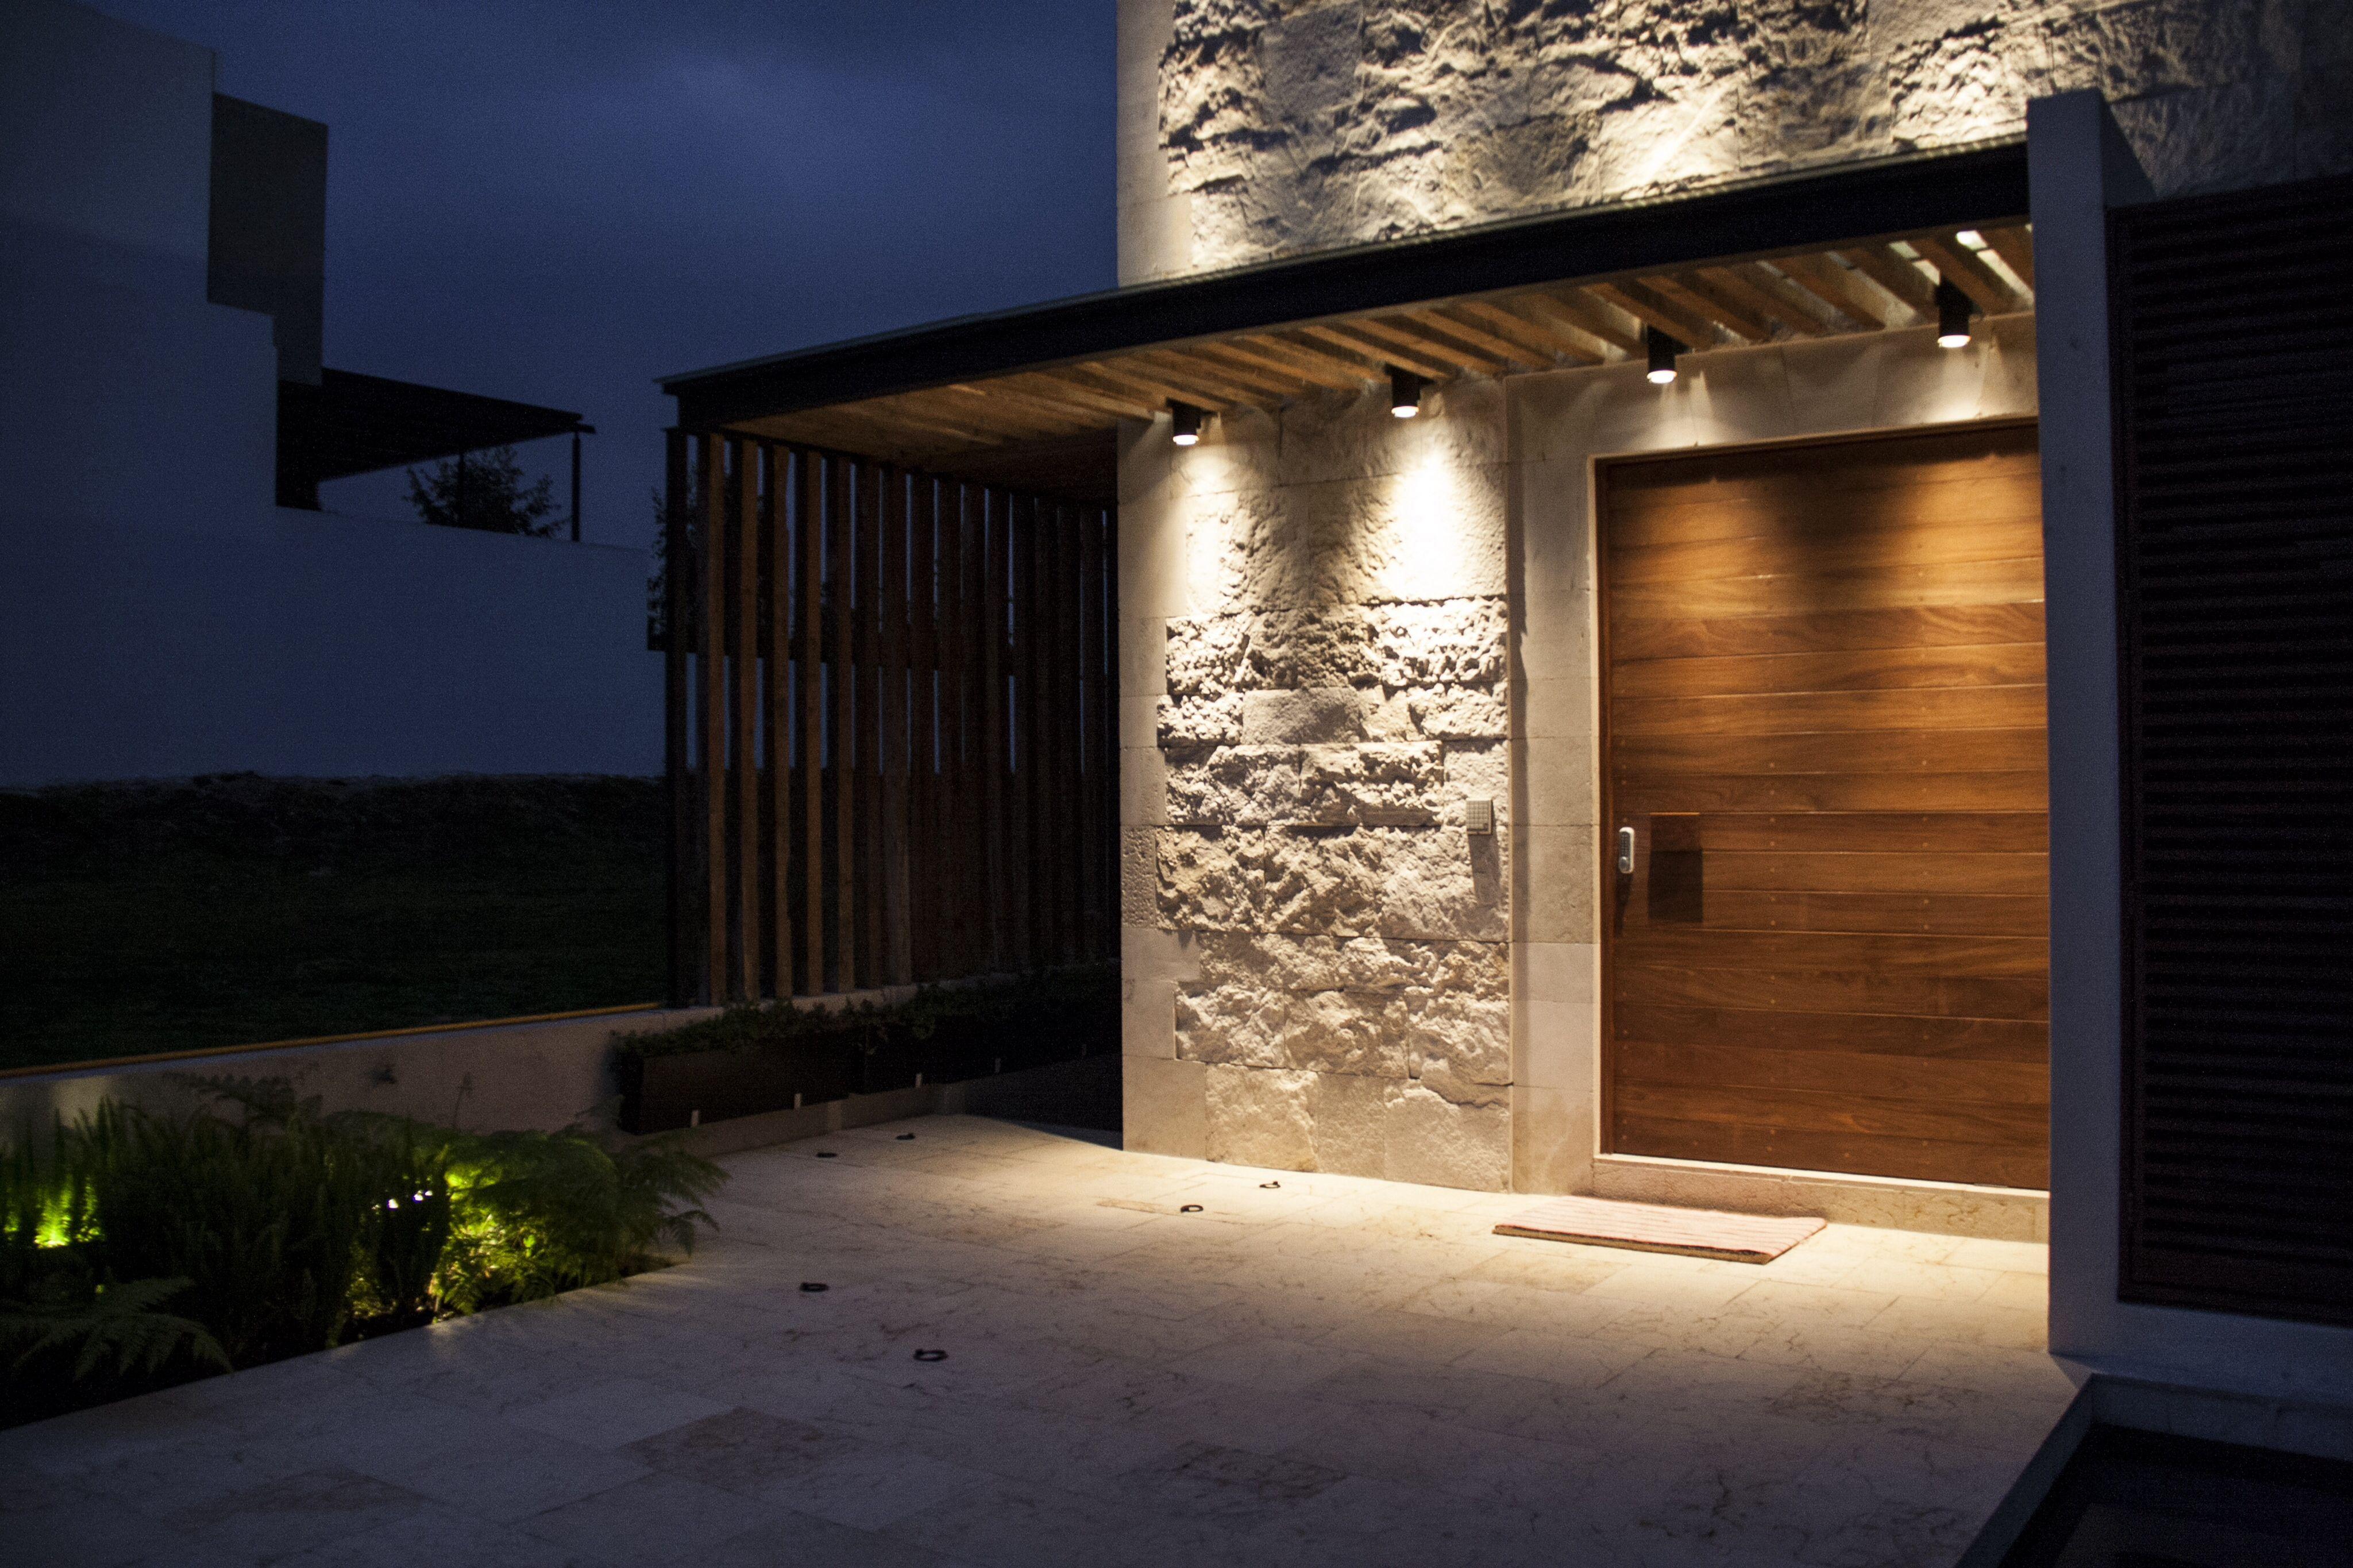 Casa ss fachada muros de piedra iluminaci n - Iluminacion para casa ...